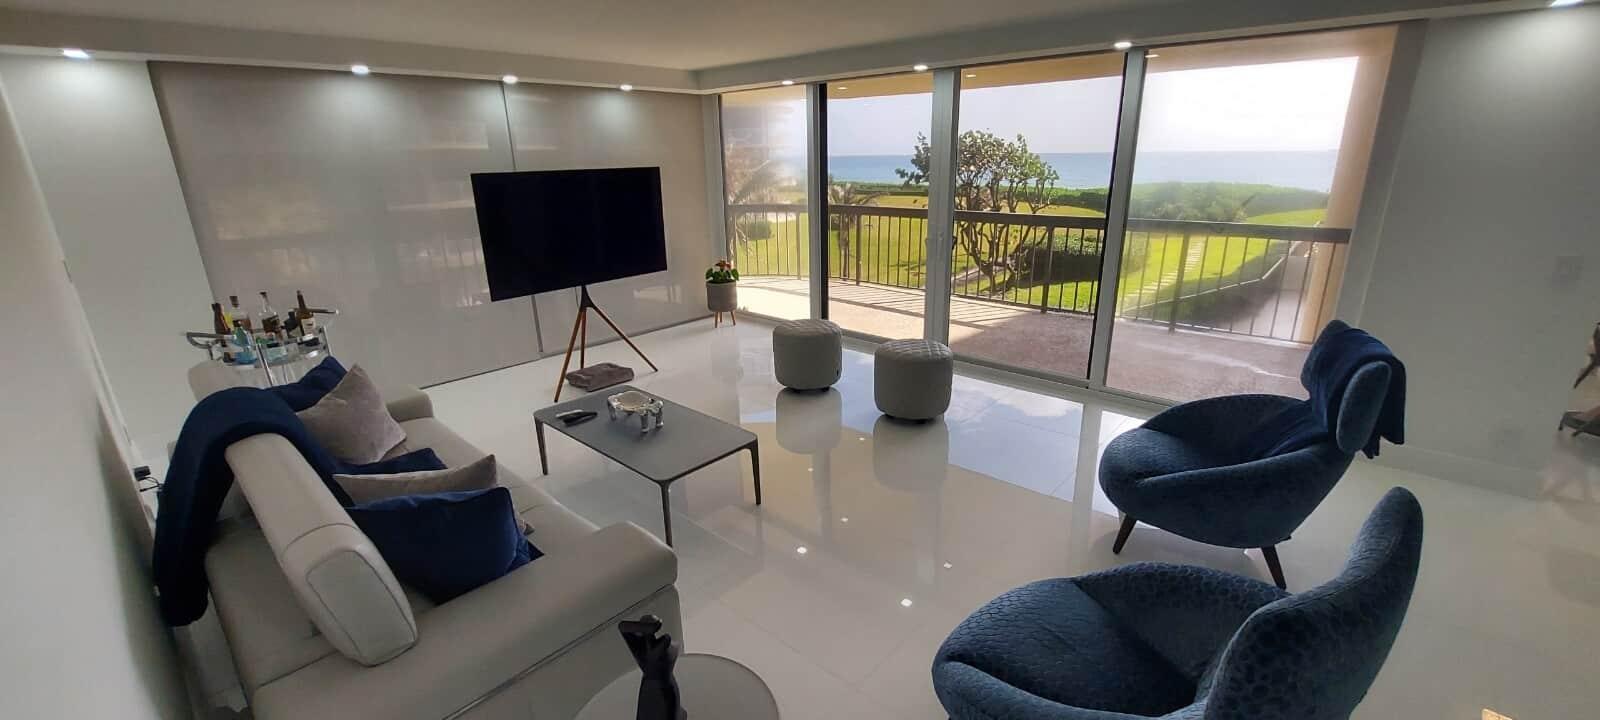 Custom Designed Family Room In Palm Beach County FL